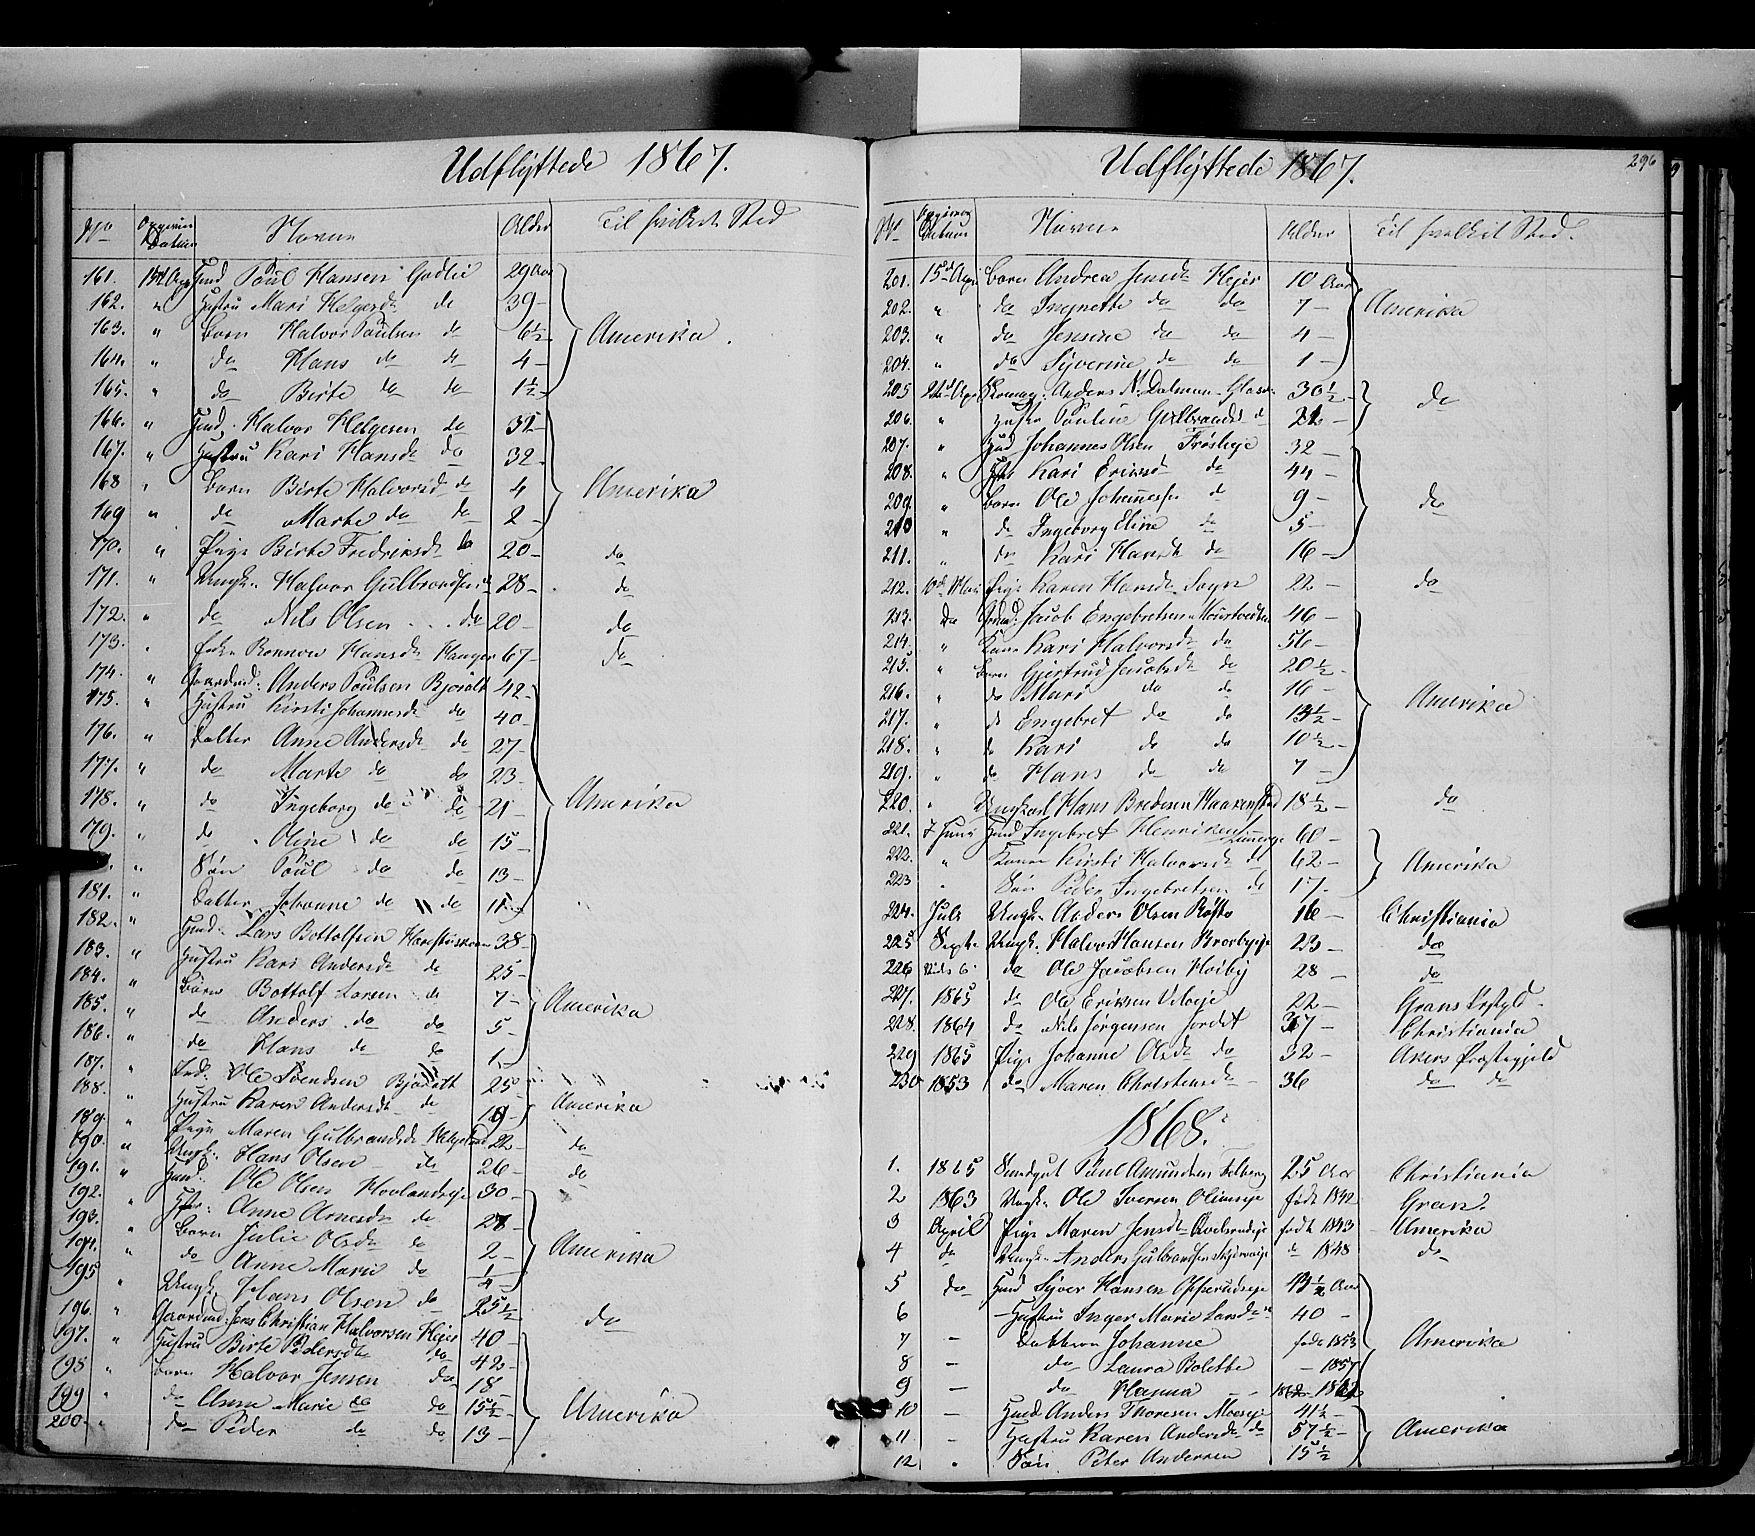 SAH, Jevnaker prestekontor, Ministerialbok nr. 7, 1858-1876, s. 296